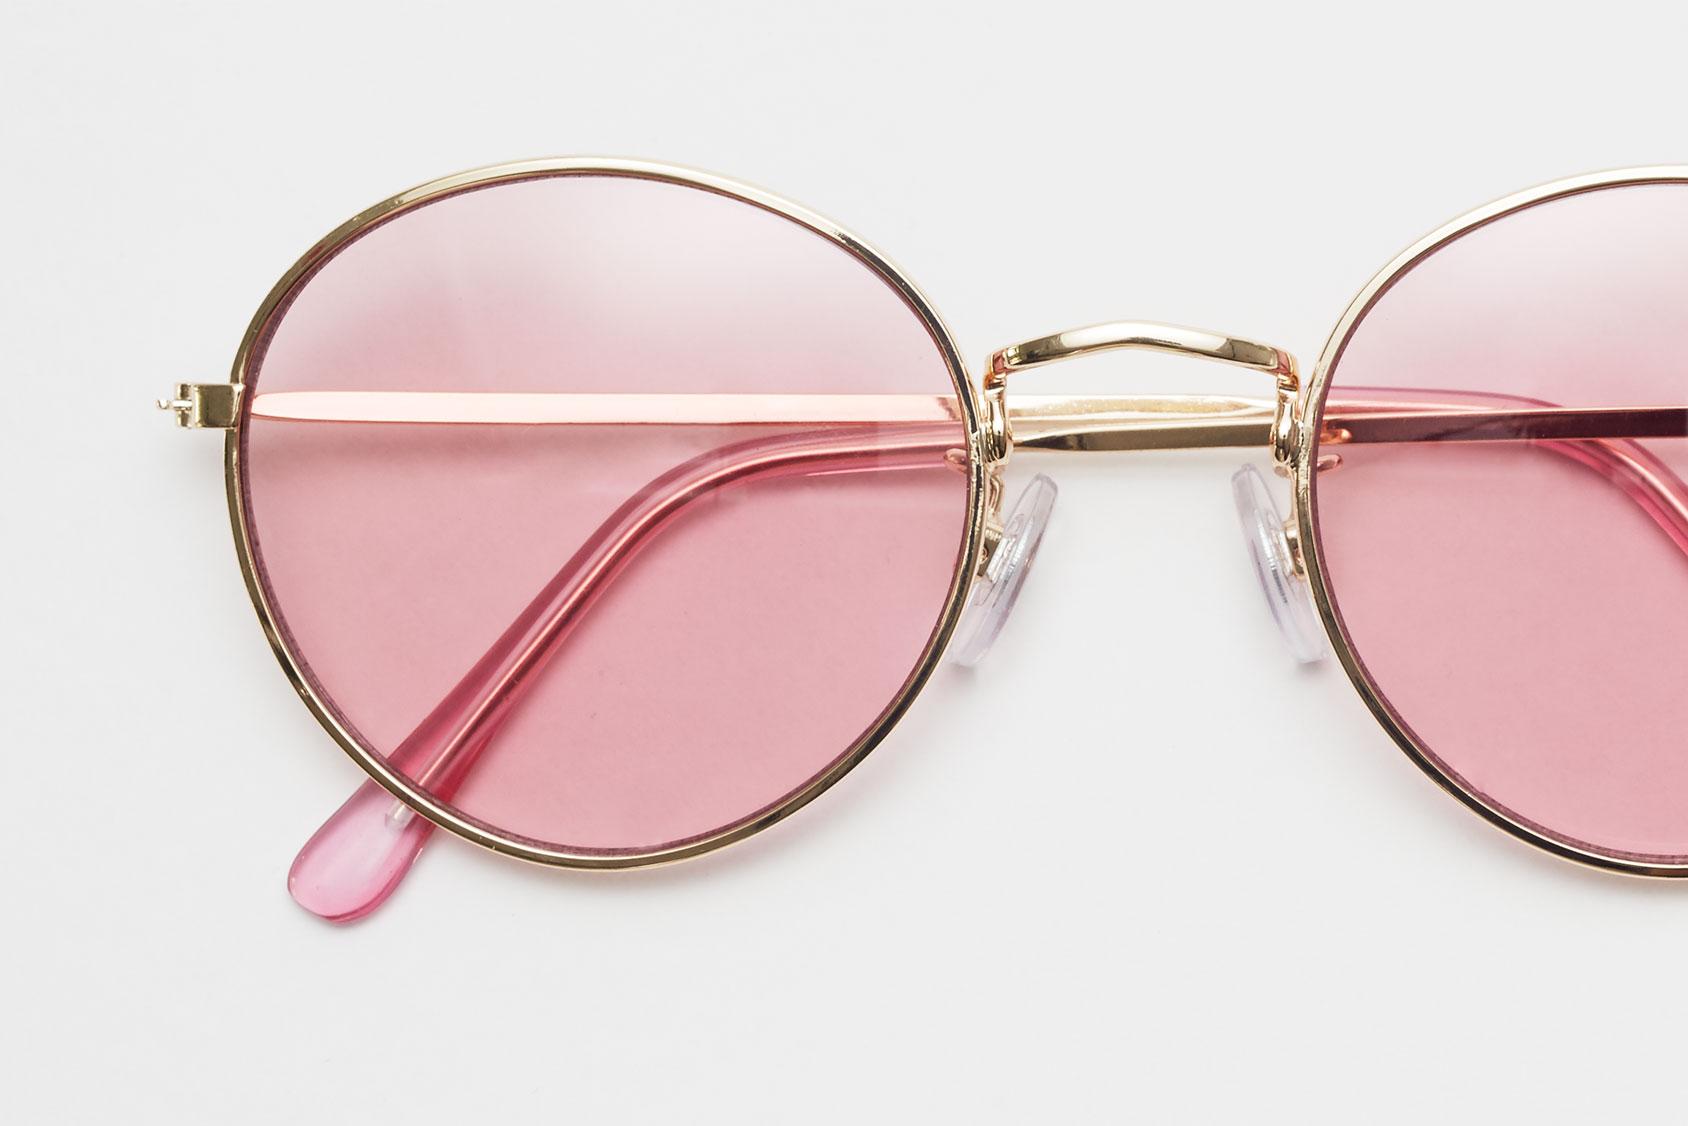 粉色H&M墨镜